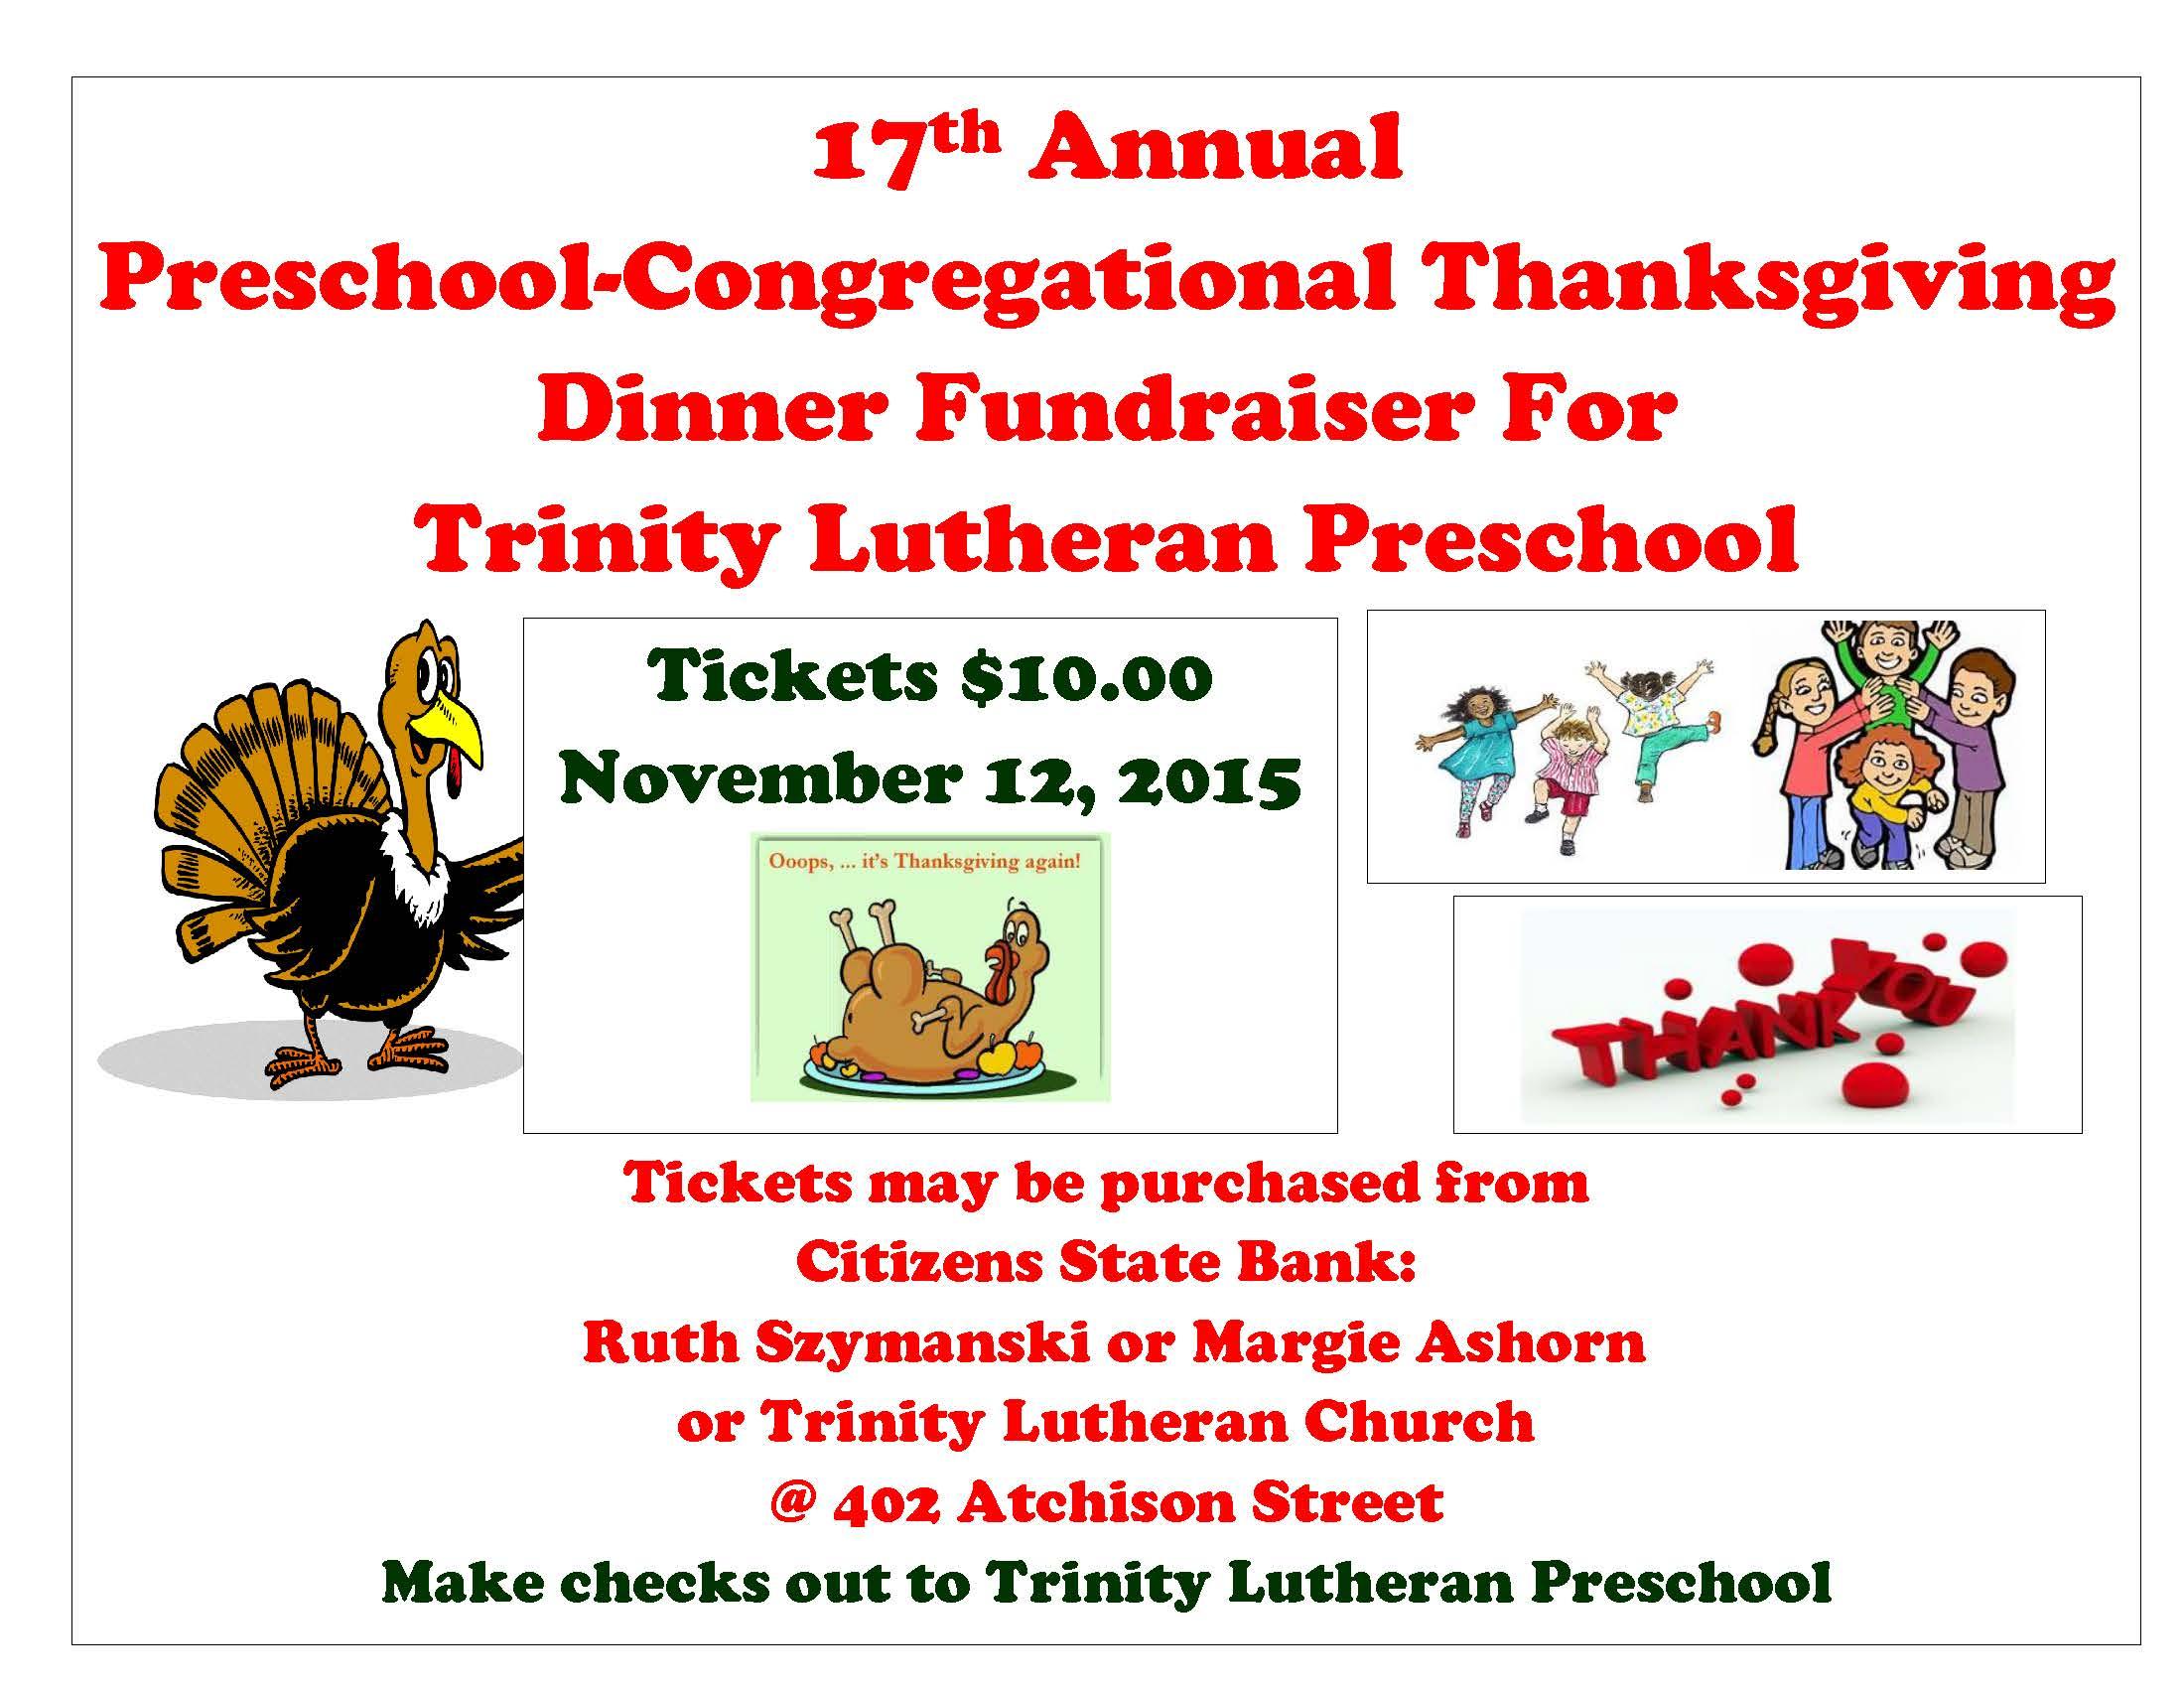 17th Annual Preschool Congregational Thanksgiving Dinner Fundraiser For Trinity Lutheran